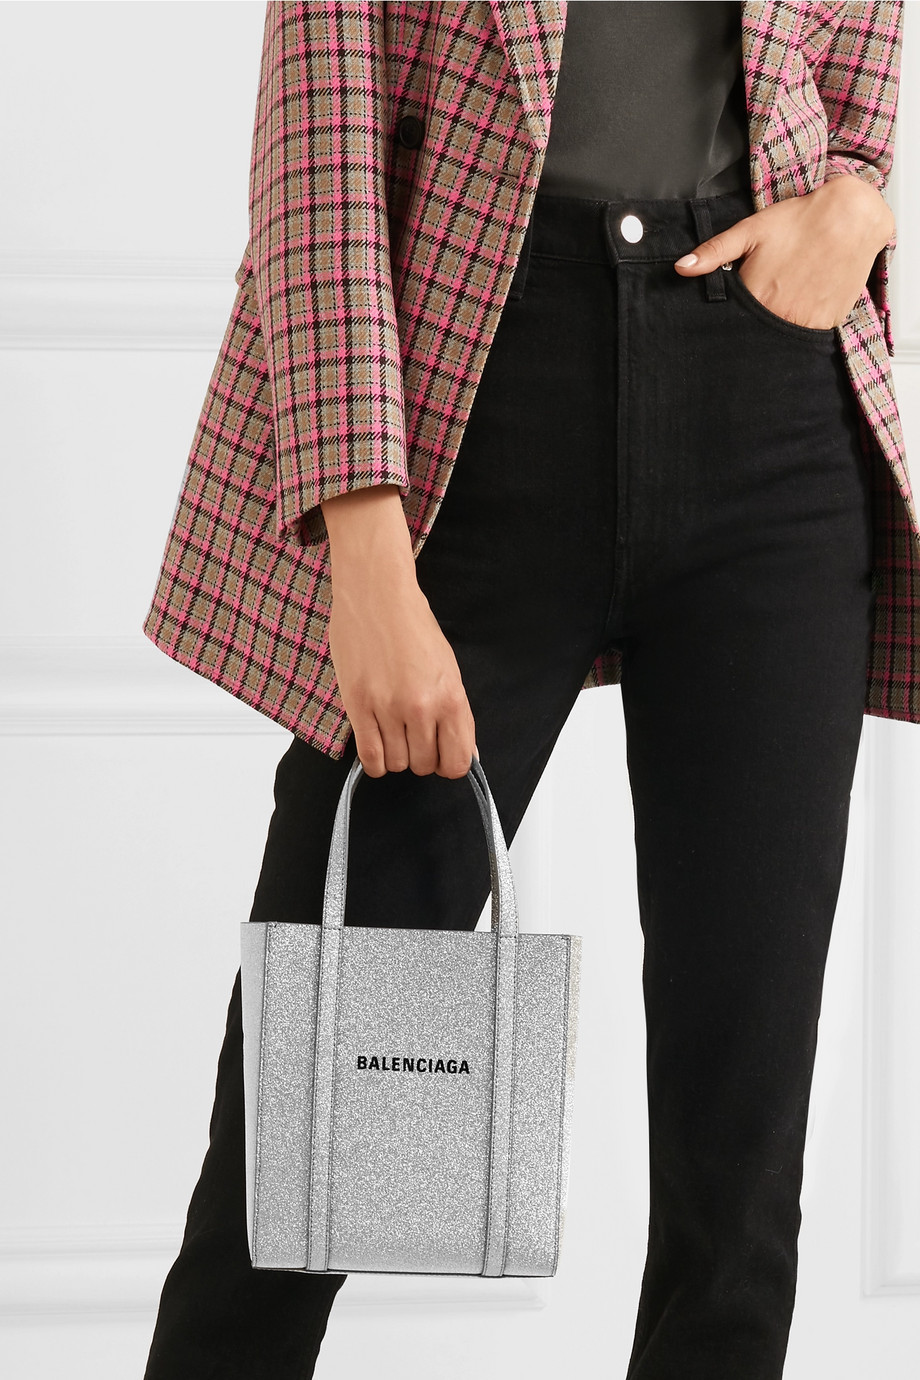 Balenciaga Everyday XXS AJ printed glittered leather tote